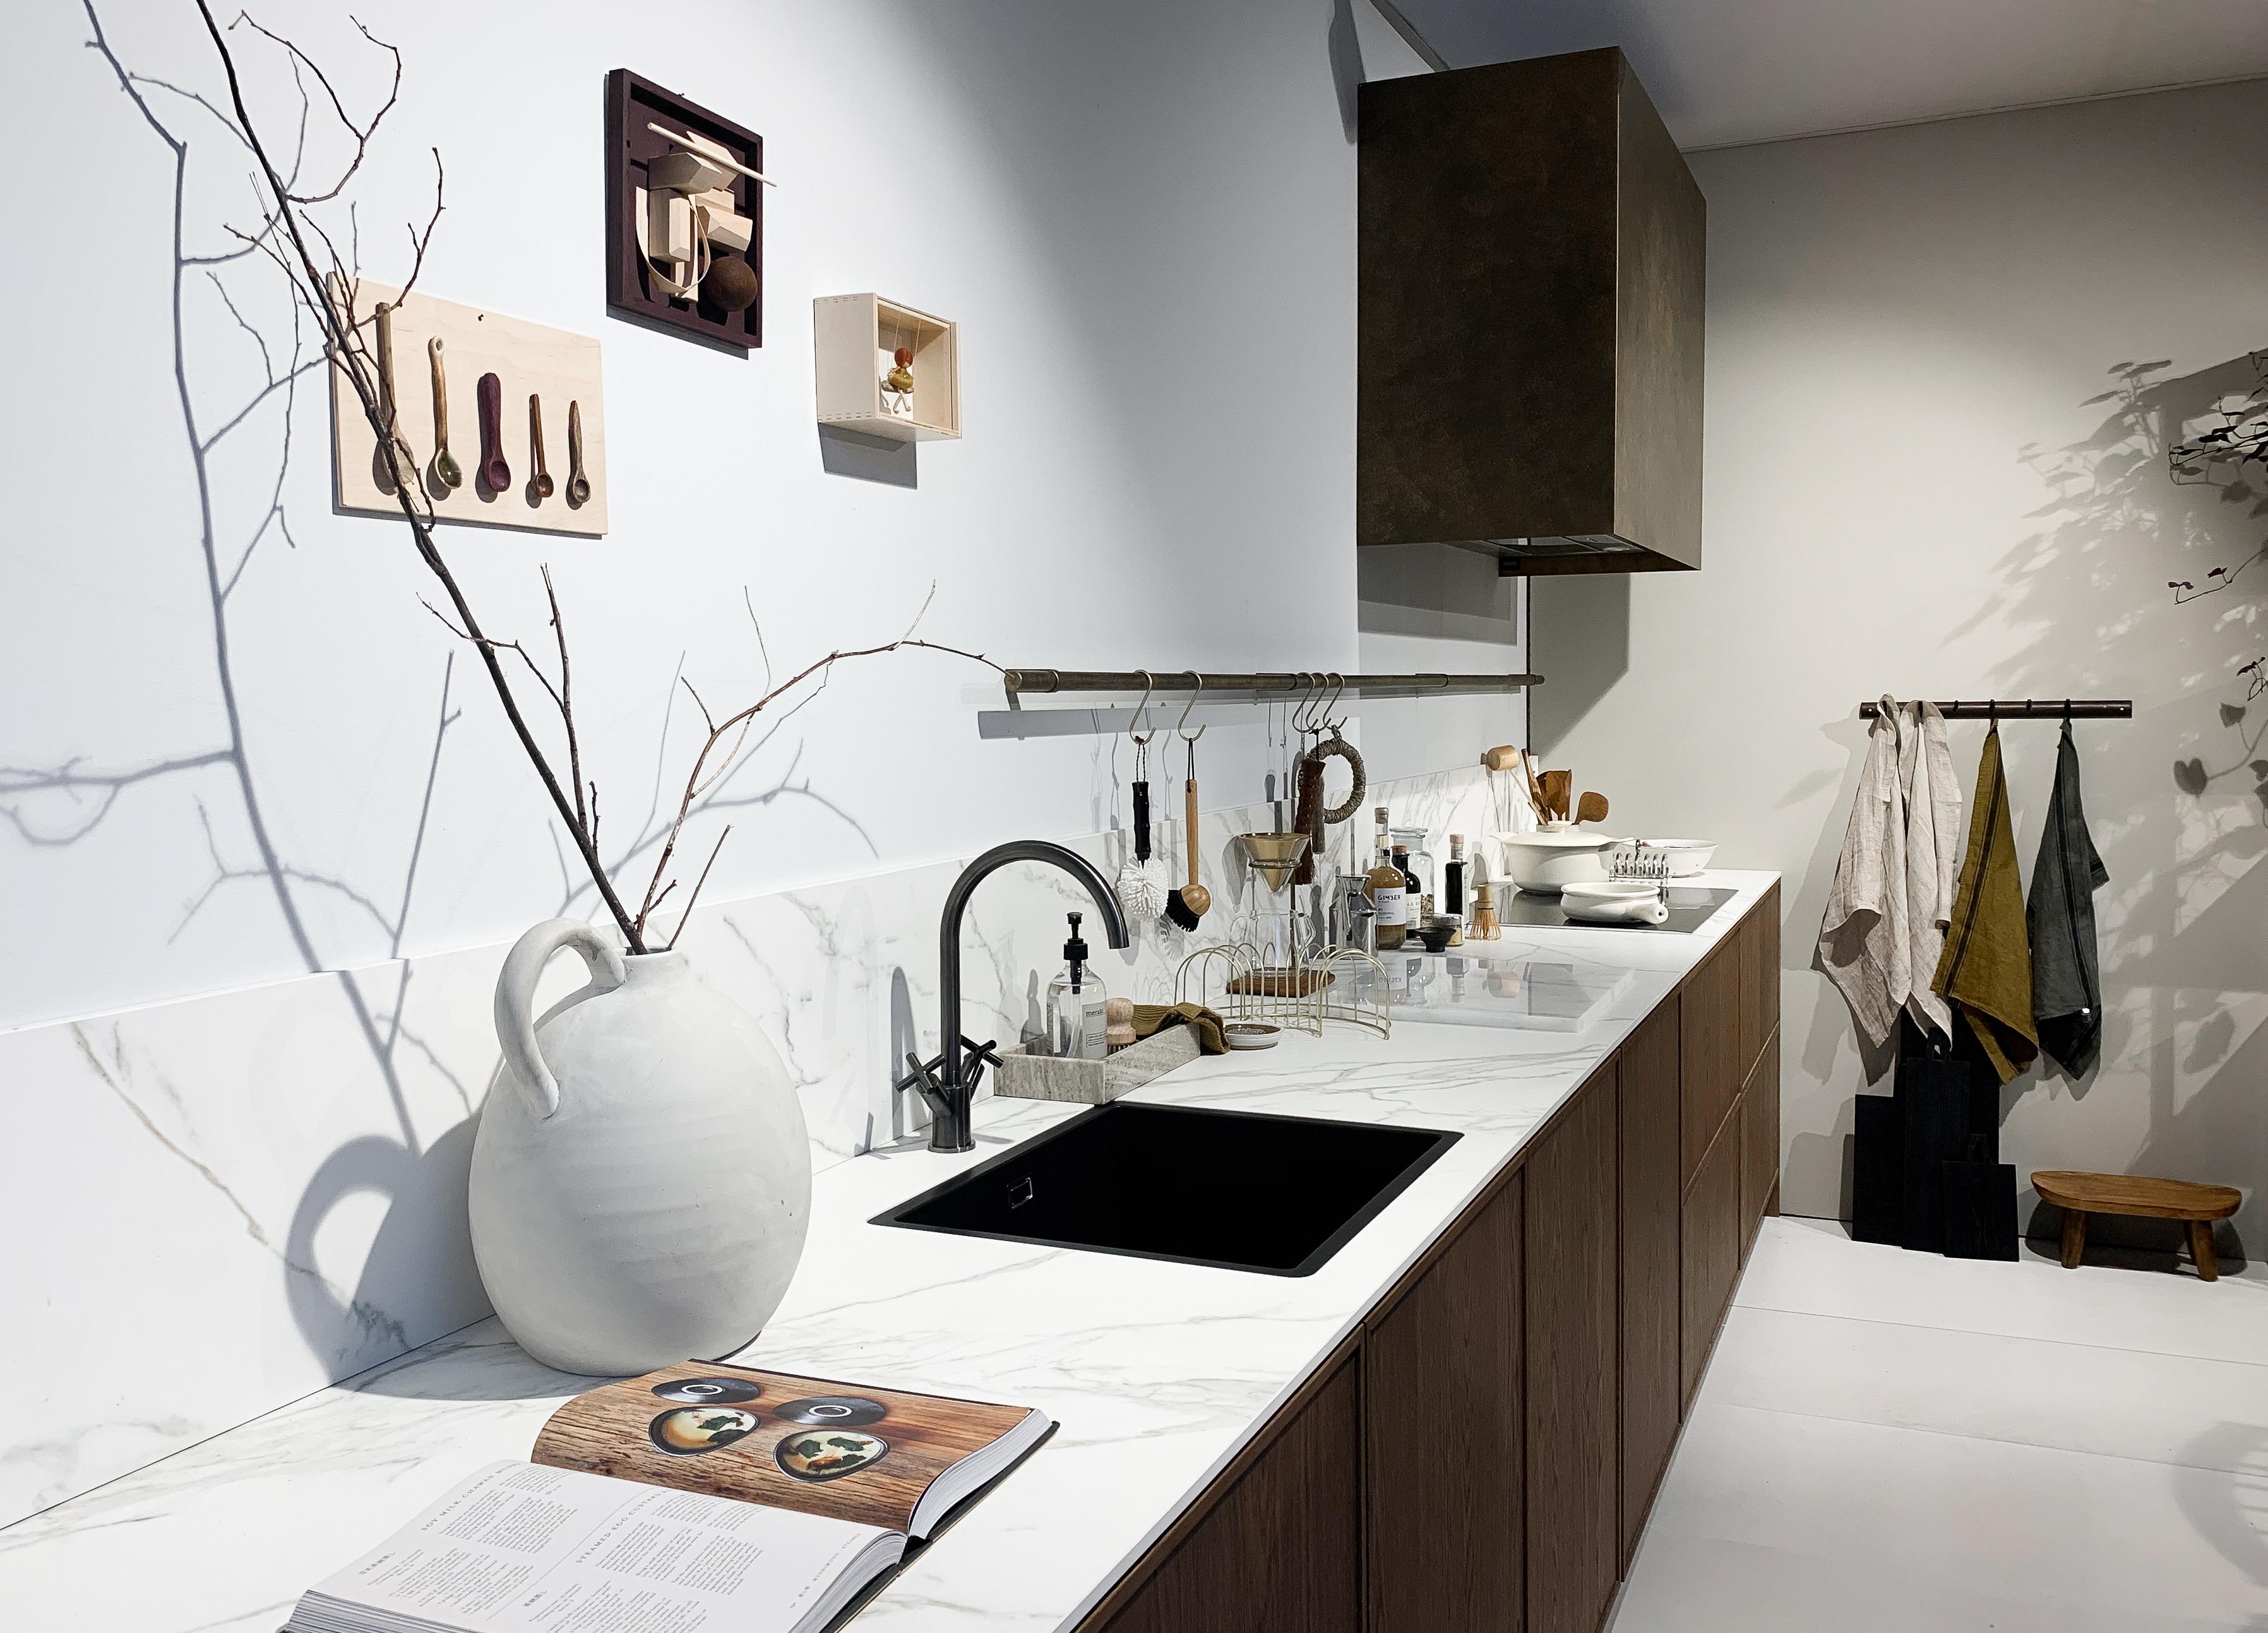 Fotoblog VT Wonen & Designbeurs 2019